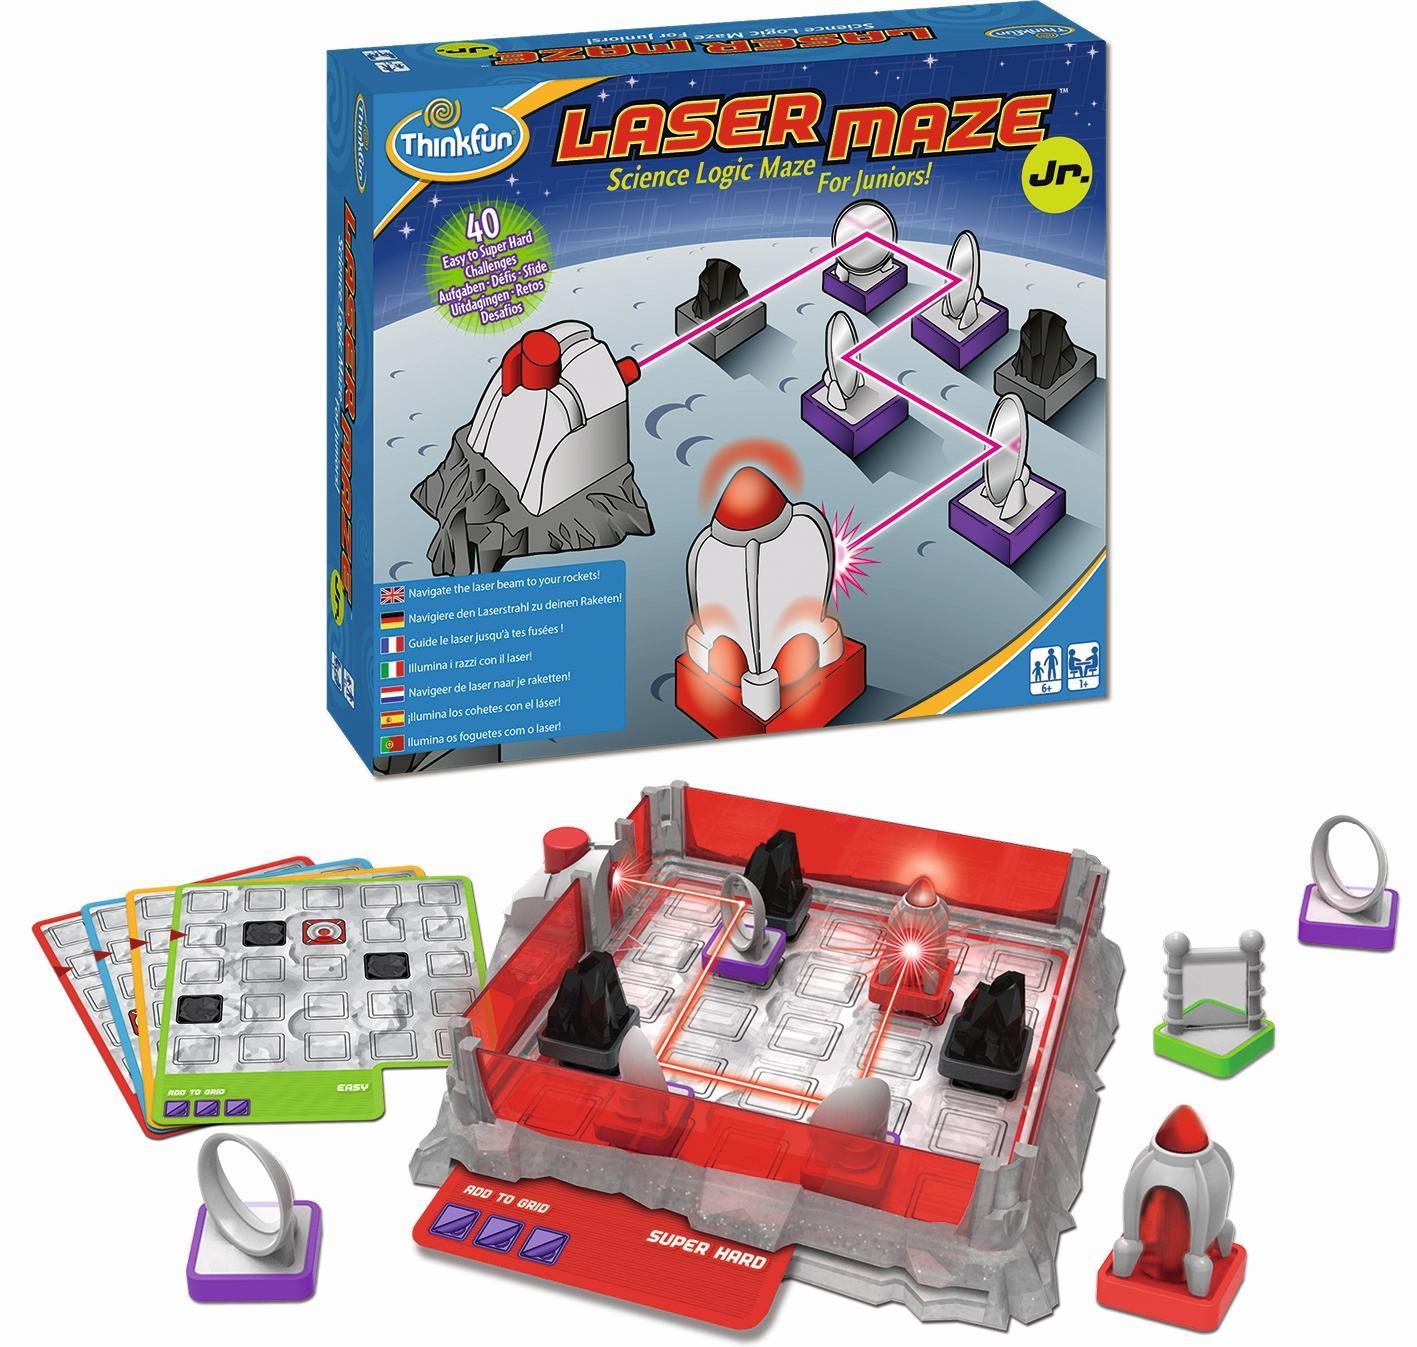 Ravensburger Thinkfun Laser Maze Junior